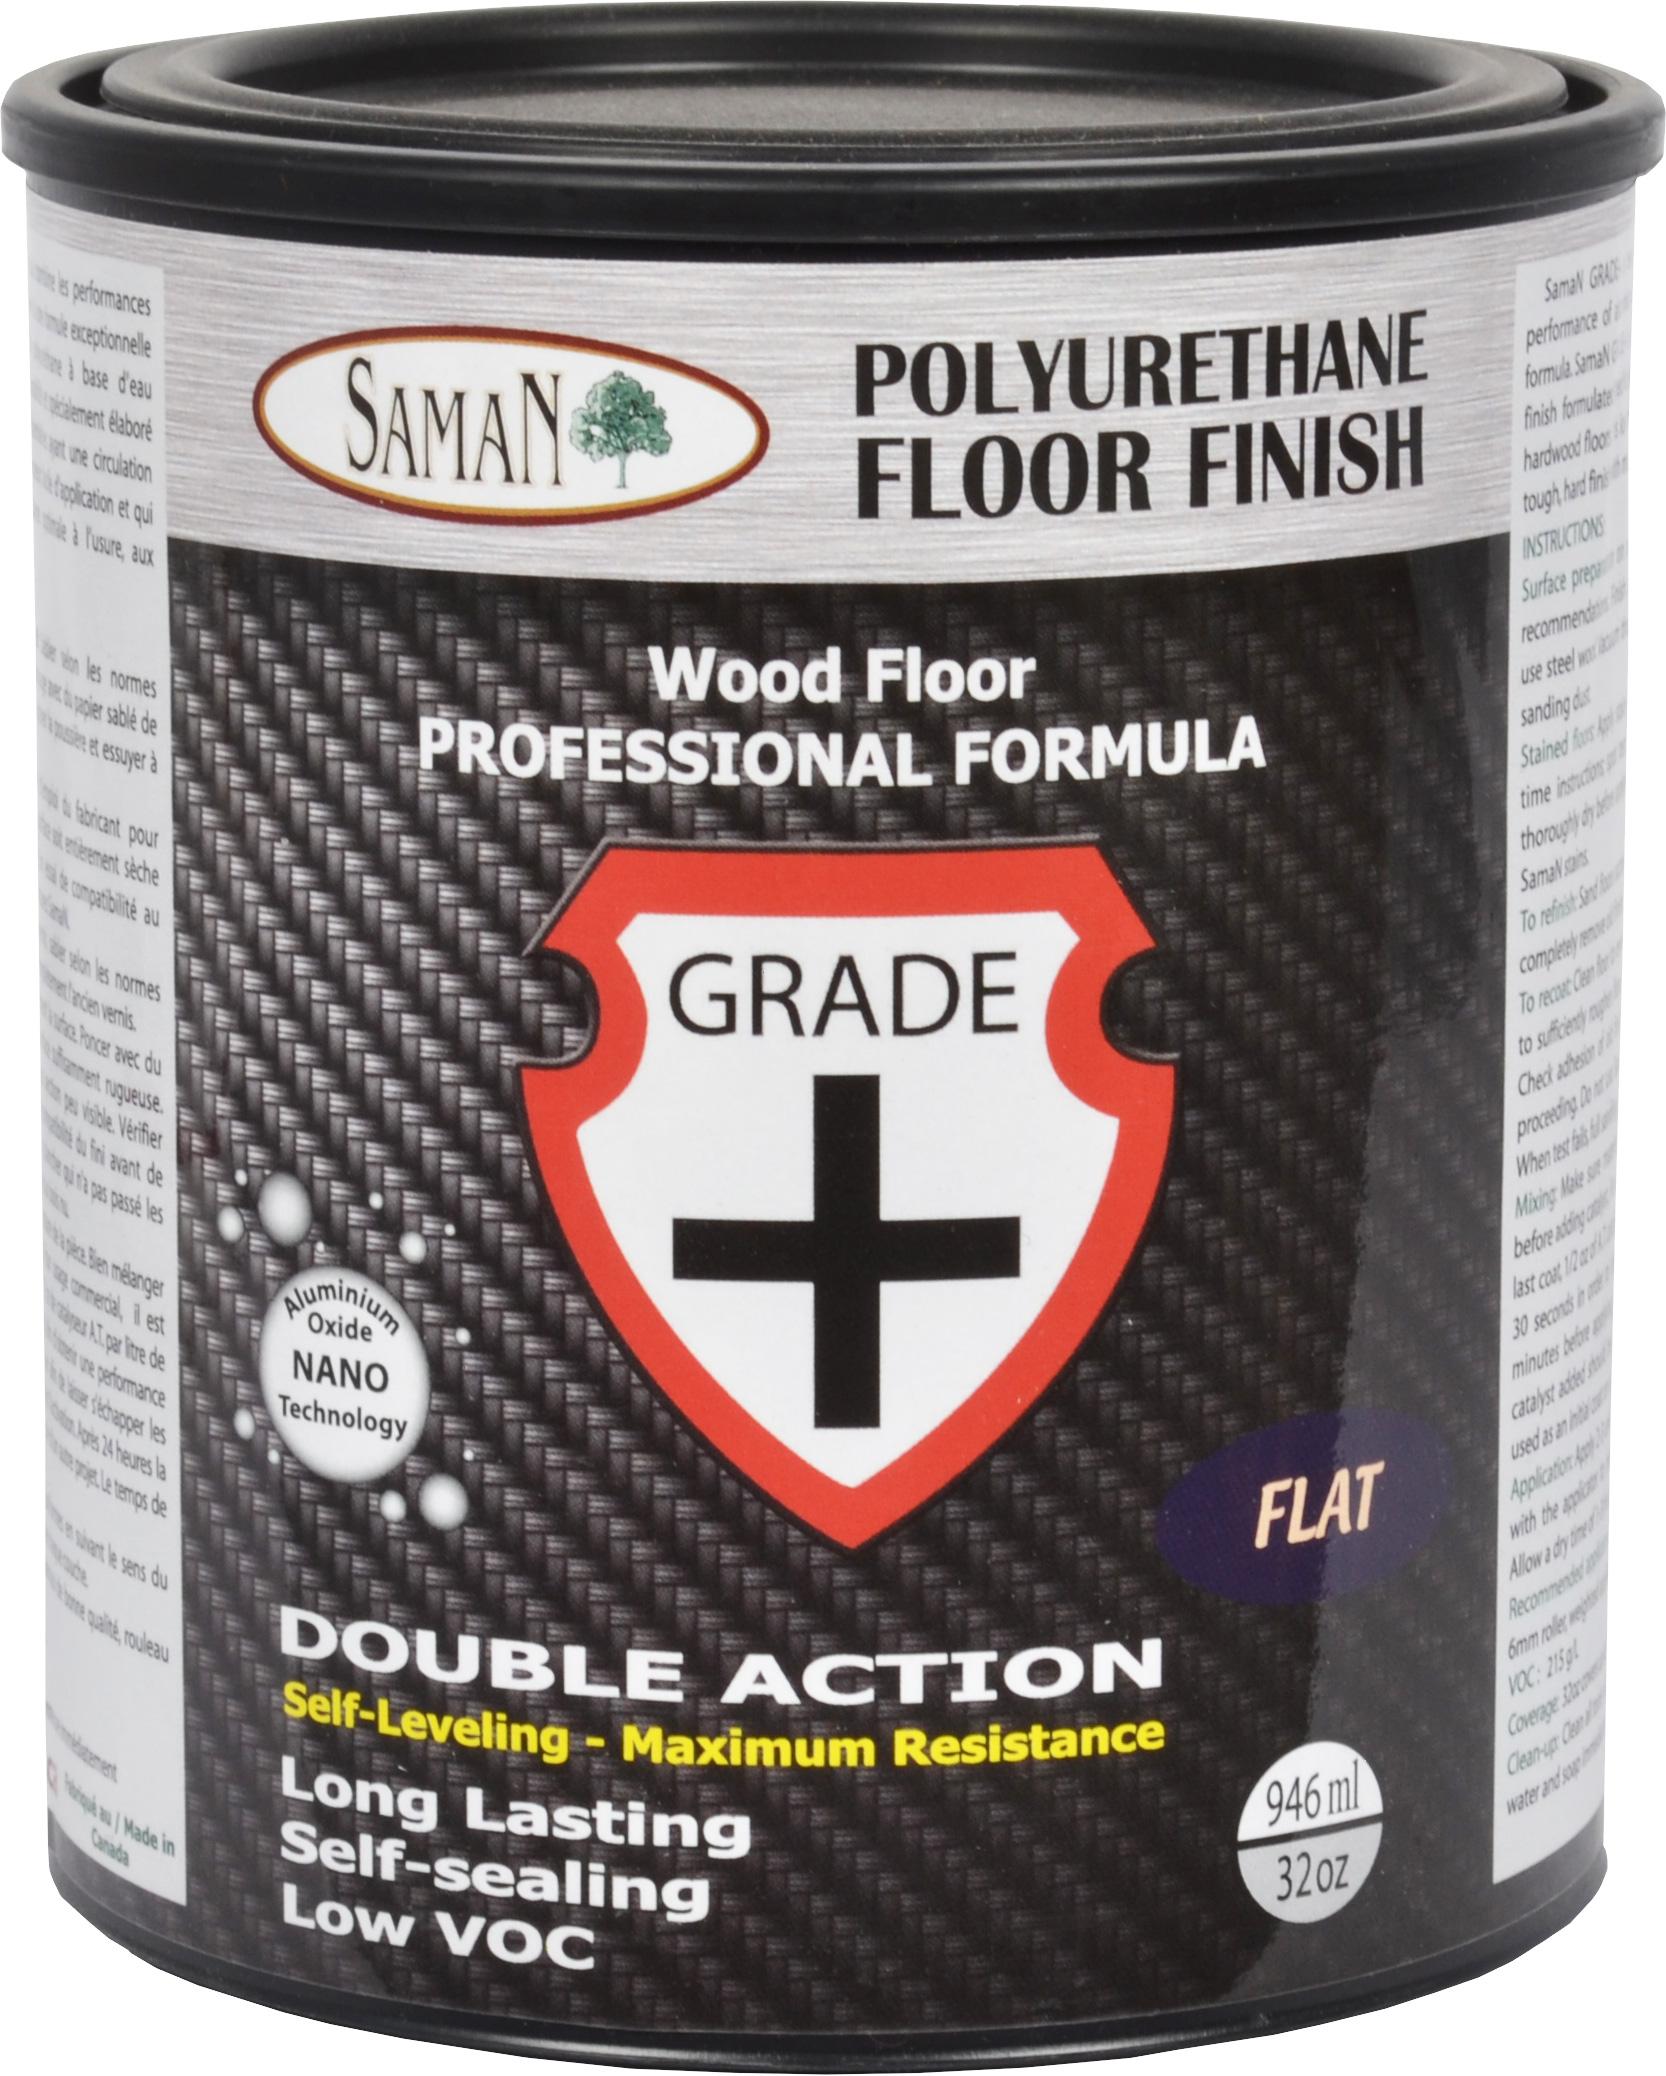 Polyurethane Floor Finish Grade Saman